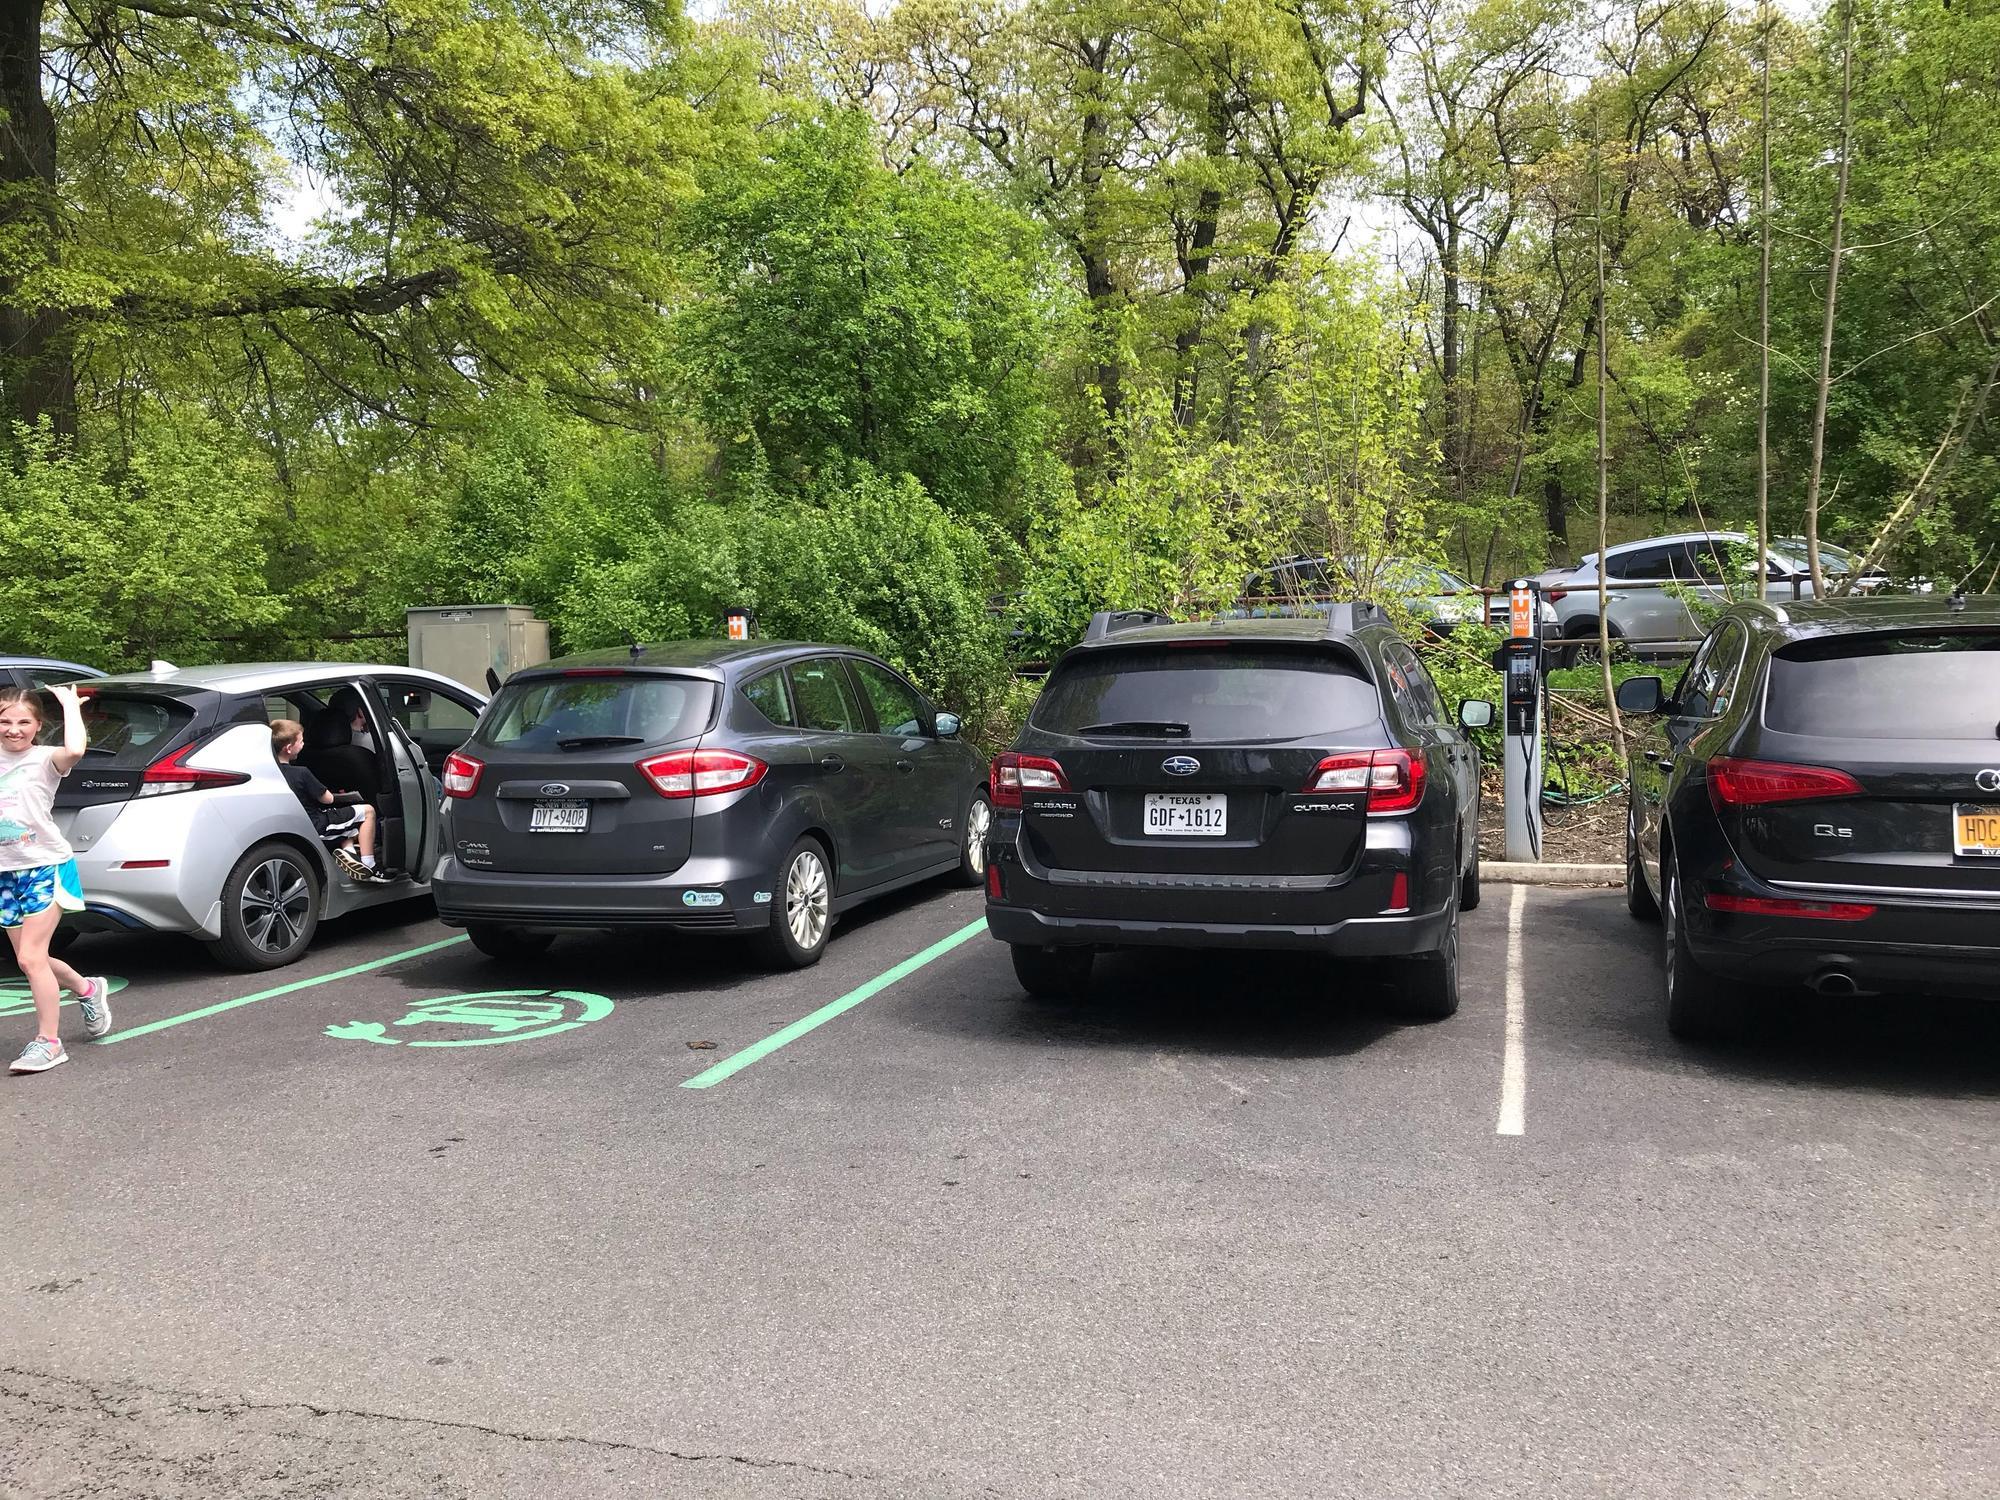 Bronx Zoo Asia Parking Lot Plugshare